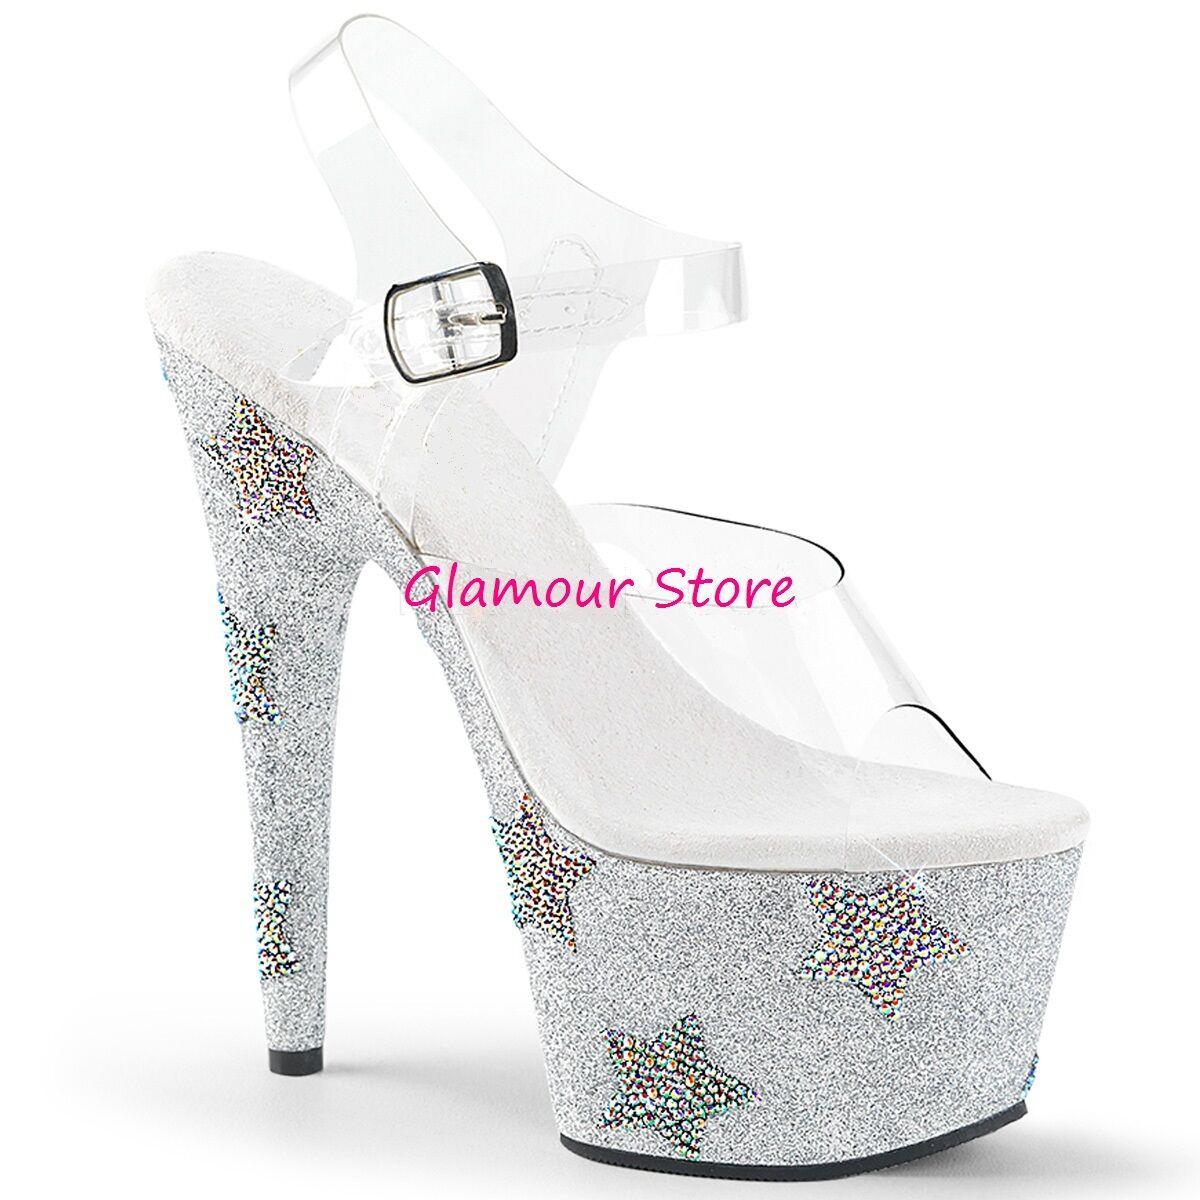 Sexy SANDALI GLITTER STRASS tacco 18 plateau dal 35 al 40 plata zapatos GLAMOUR